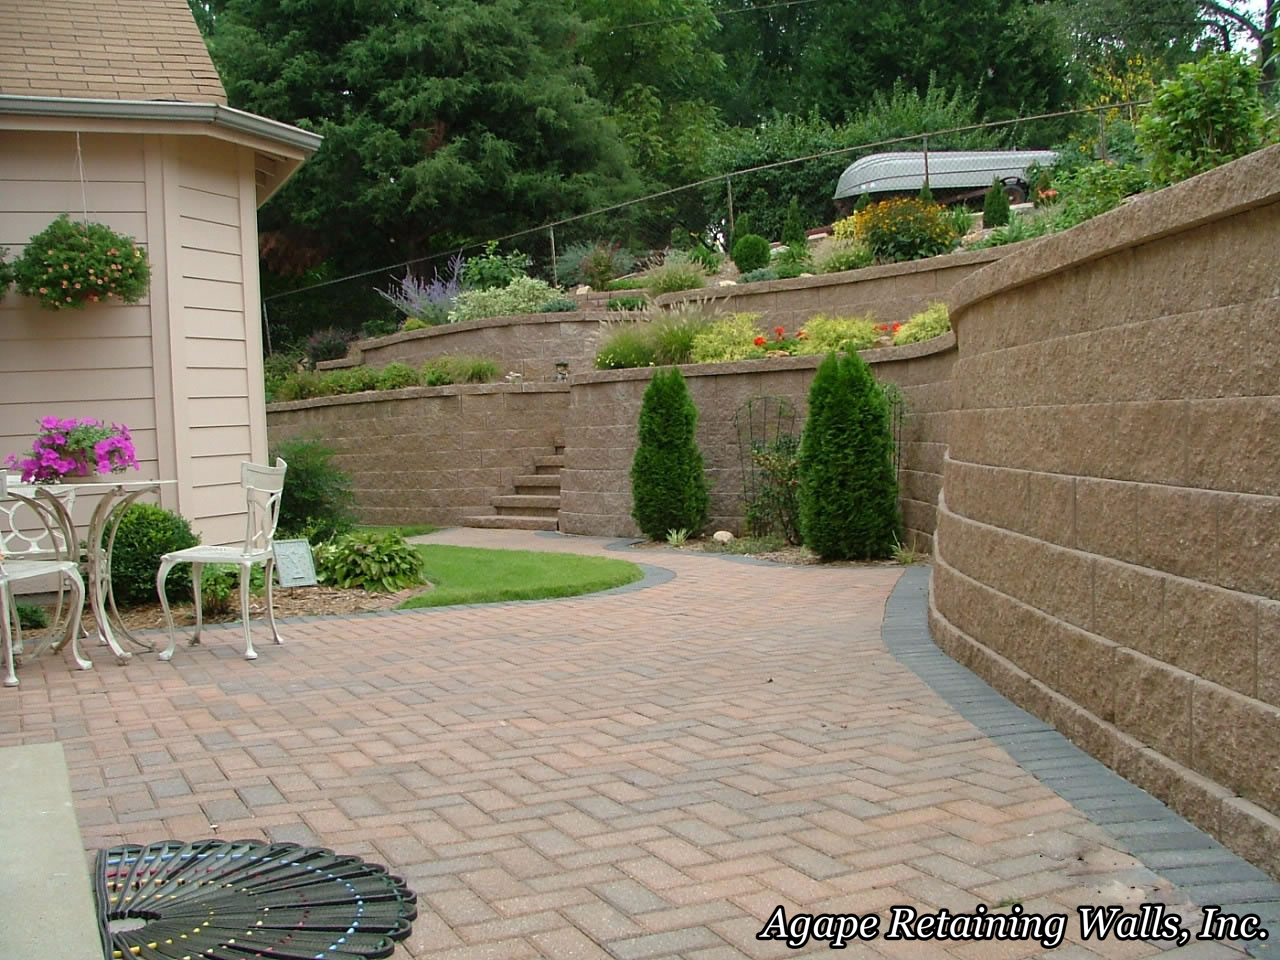 Retaining Wall Backyard Images : agape retaining walls inc built these retaining walls in kirkwood